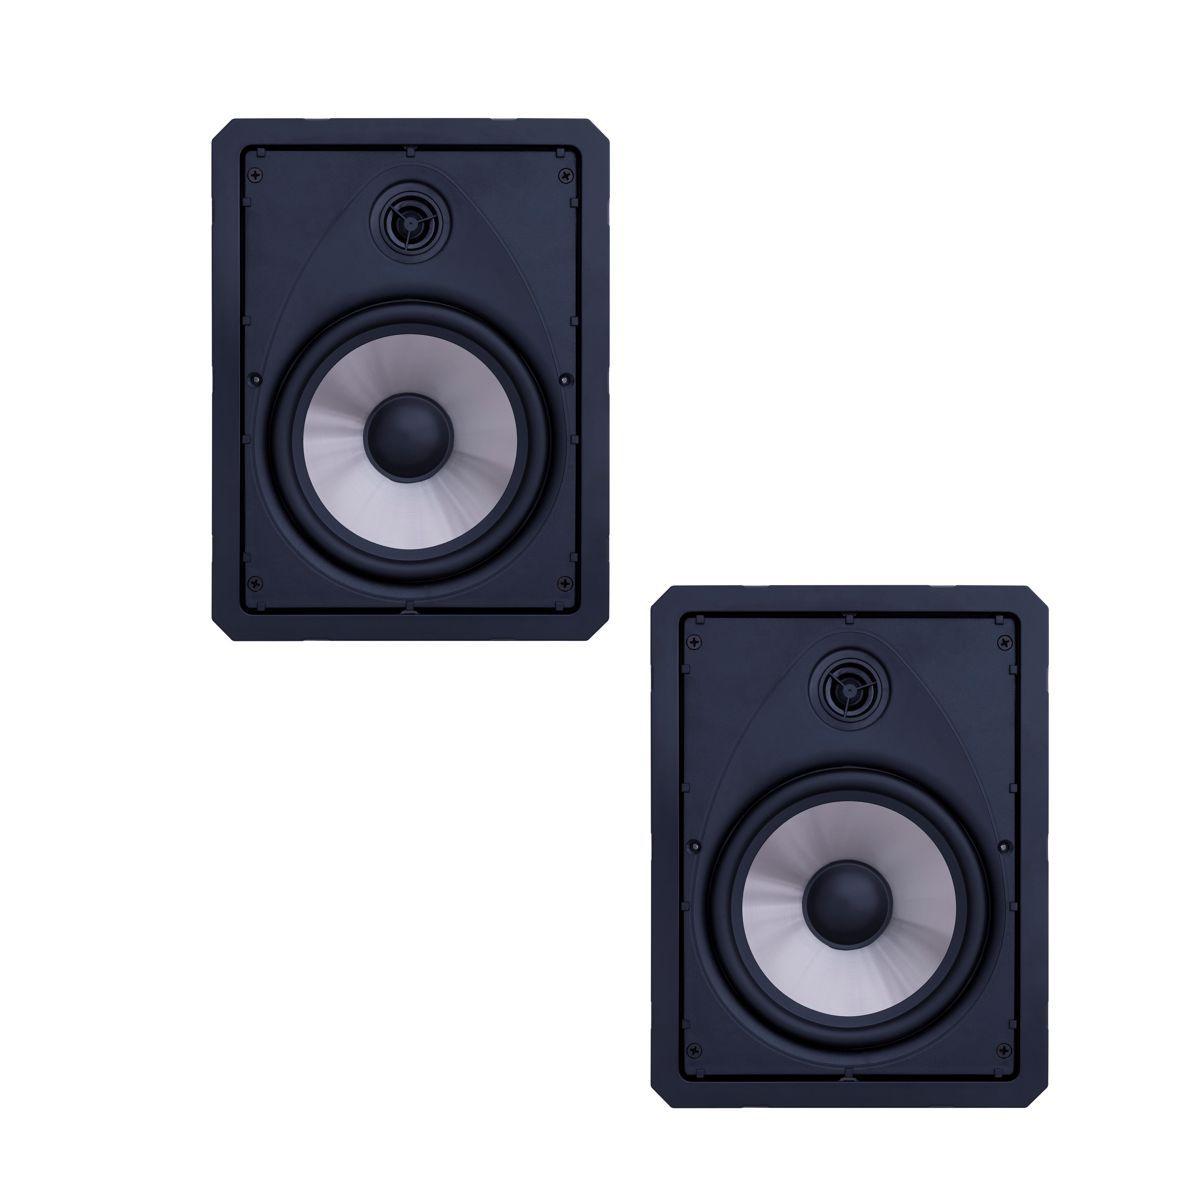 Kit Amplificador de Parede Bluetooth LAC NG + 4 Caixas Acústicas de Embutir LR6-120 BL Loud